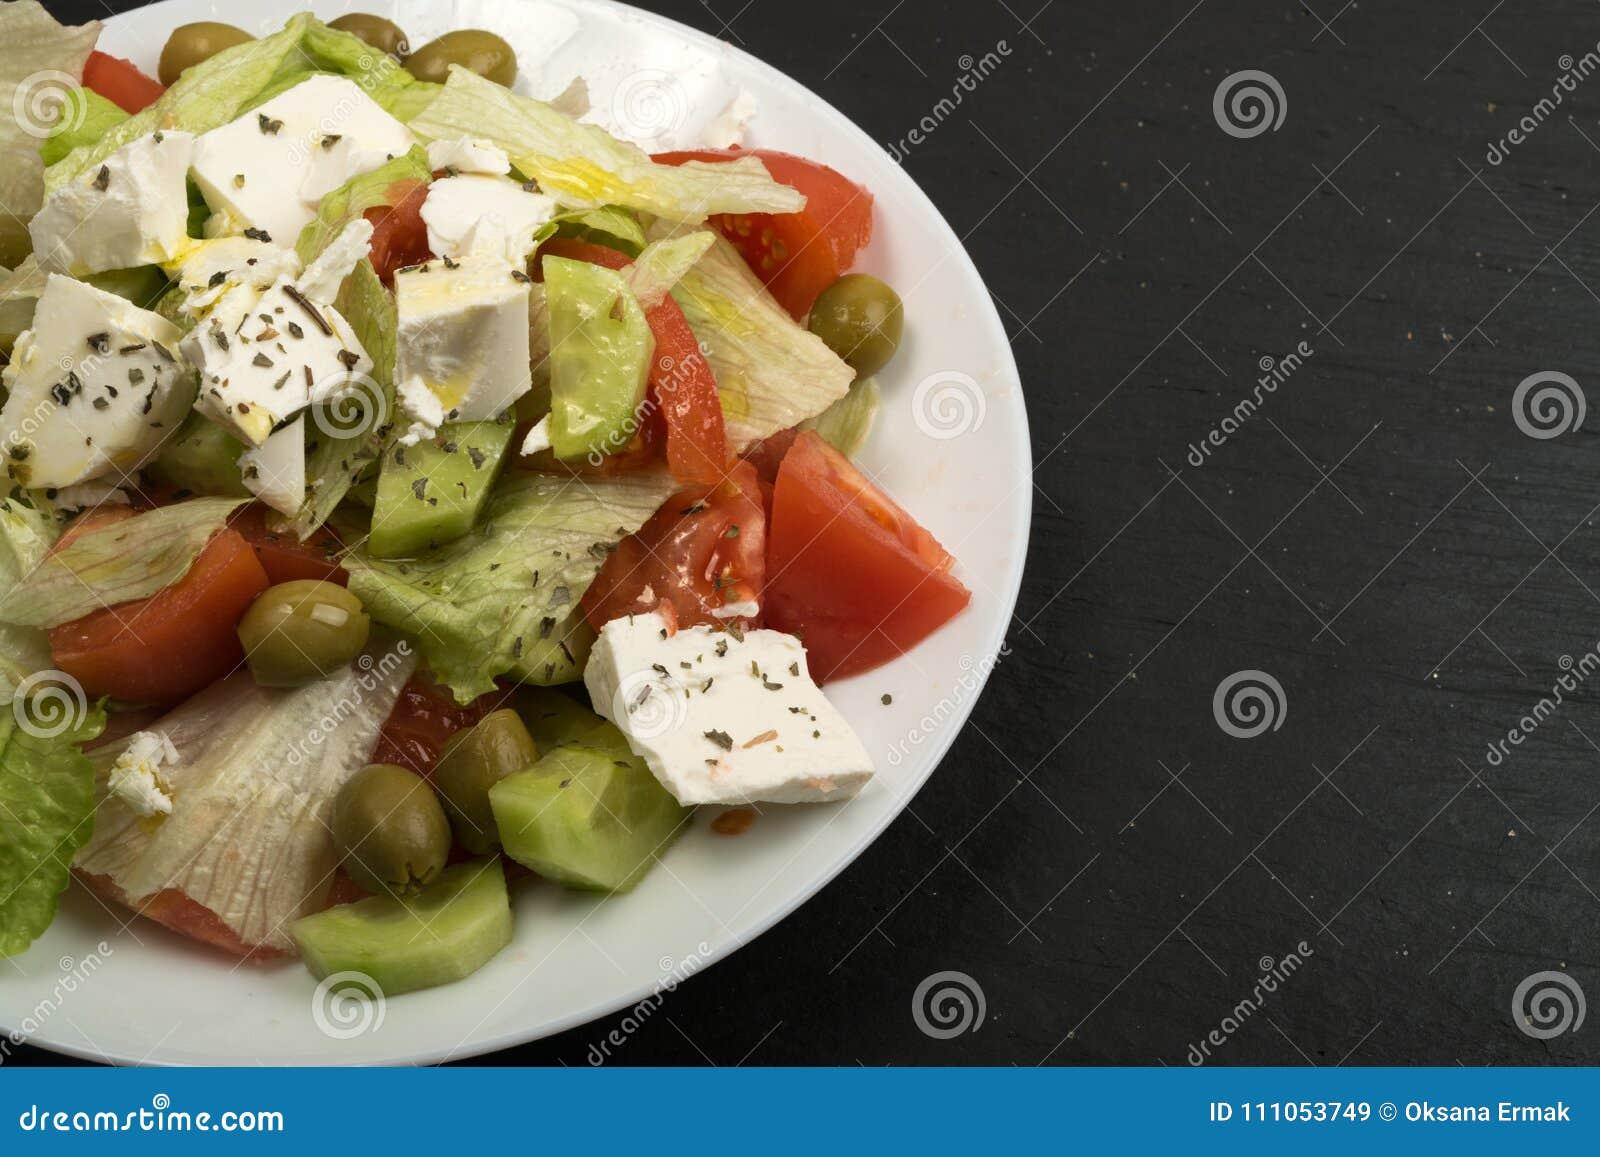 Greek Salad Or Garden Salad Stock Image Image Of Healthy